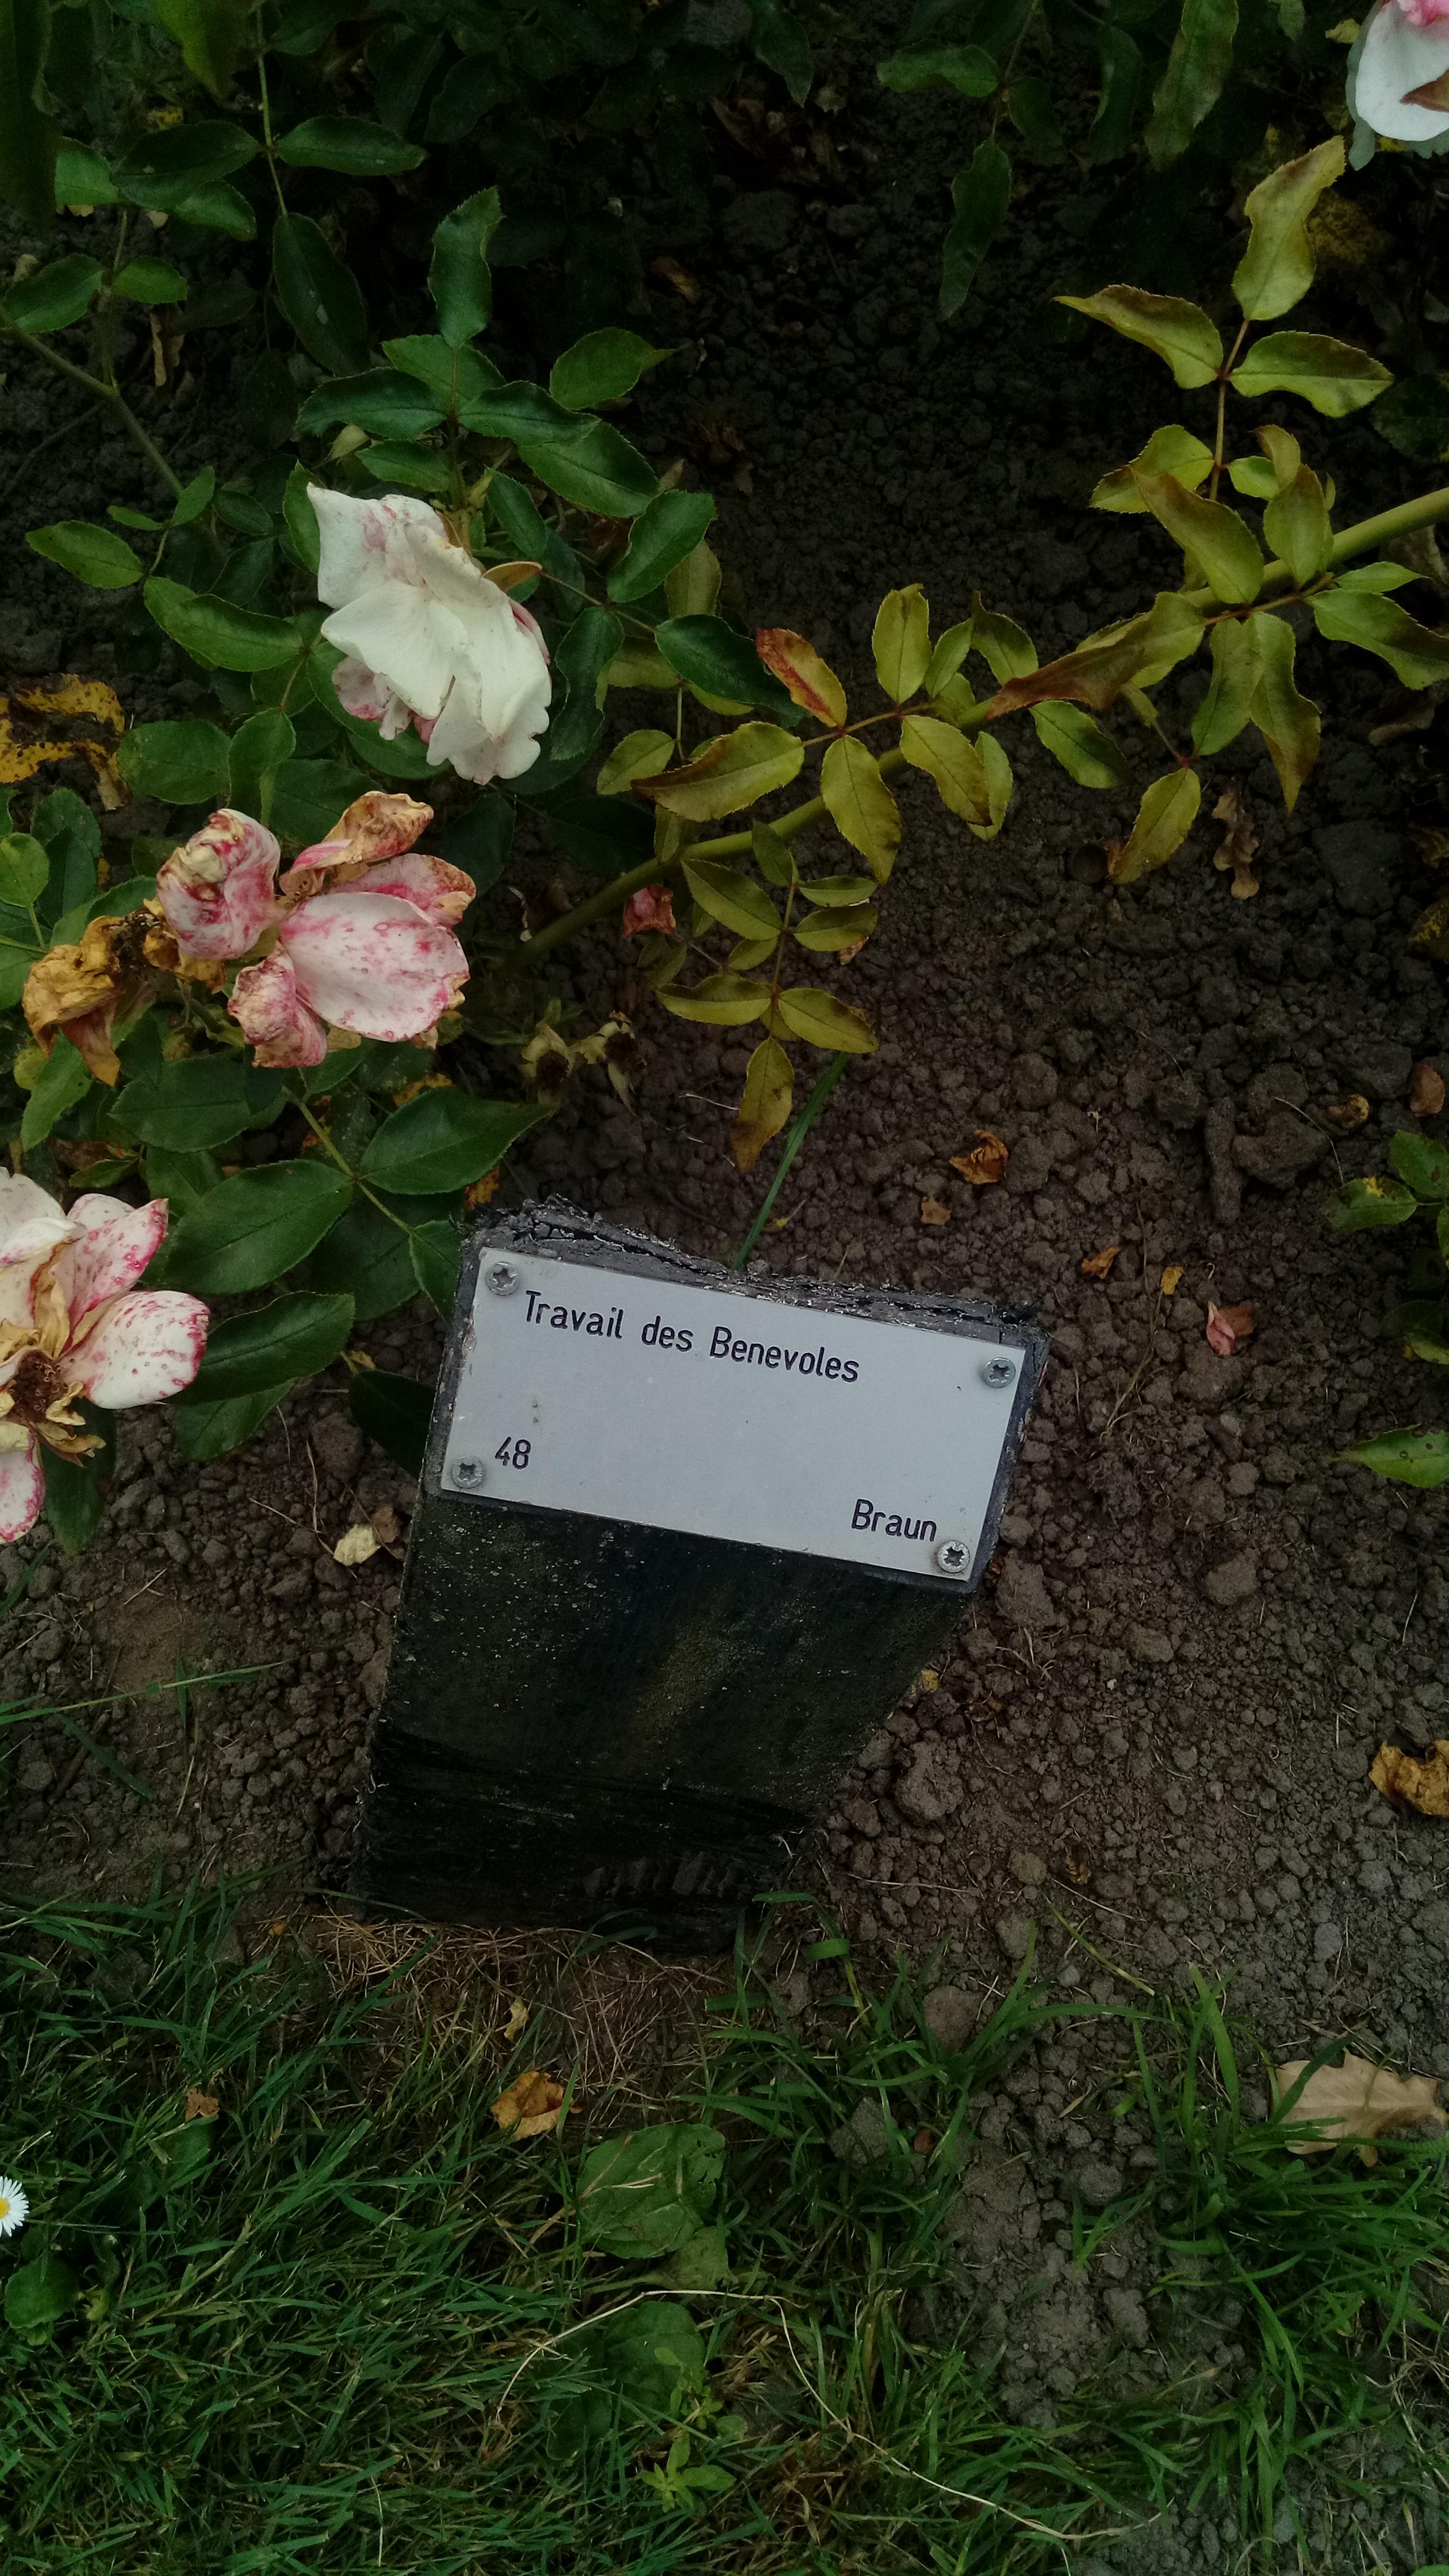 File20. Travail de Benevoles   Braun sign, Rosarium Winschoten ...